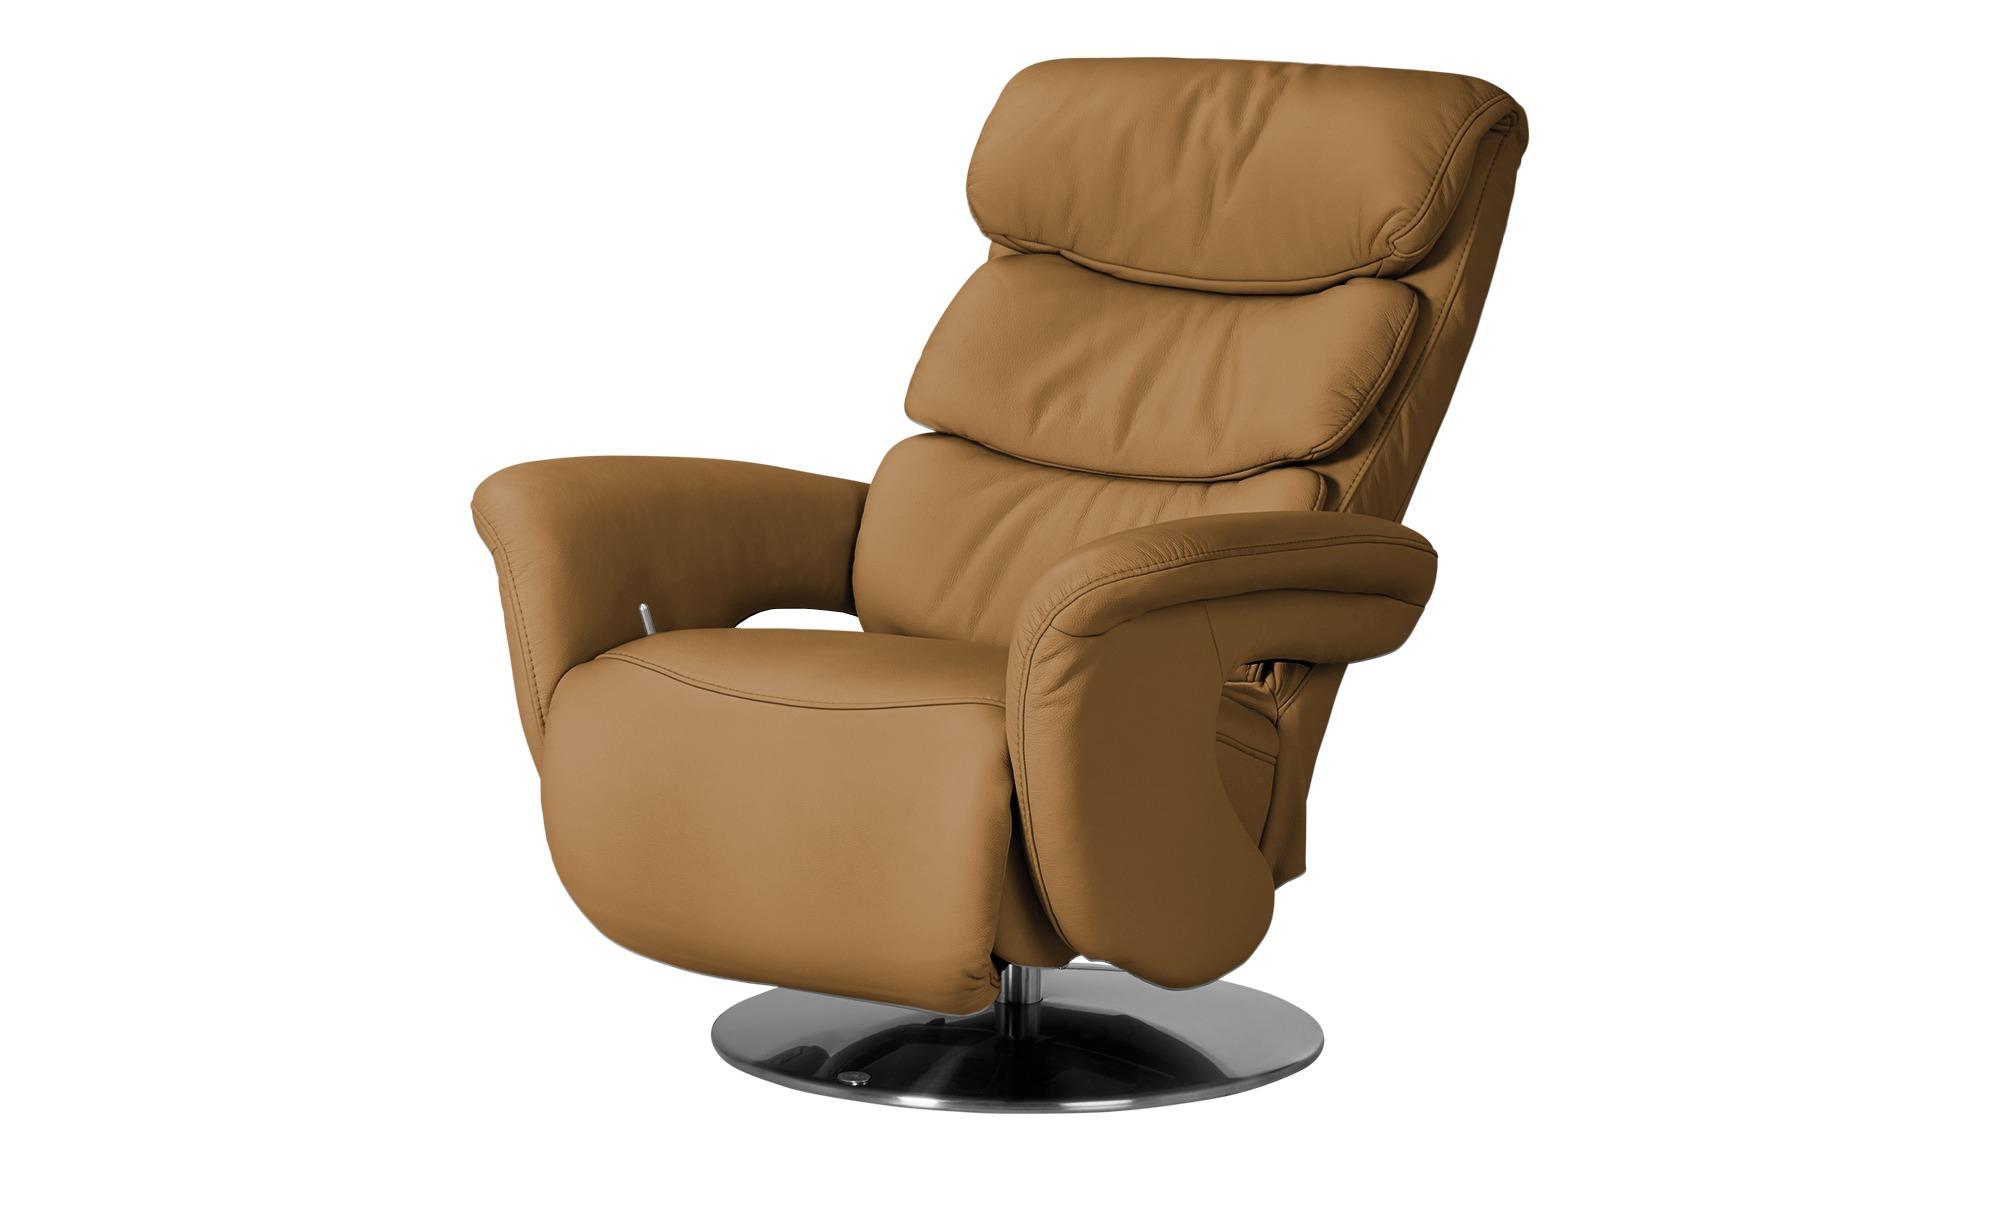 himolla Leder-Relaxsessel gelb - Leder 7228 ¦ gelb ¦ Maße (cm): B: 83 H: 109 T: 90 Polstermöbel > Sessel > Fernsehsessel - Höffner